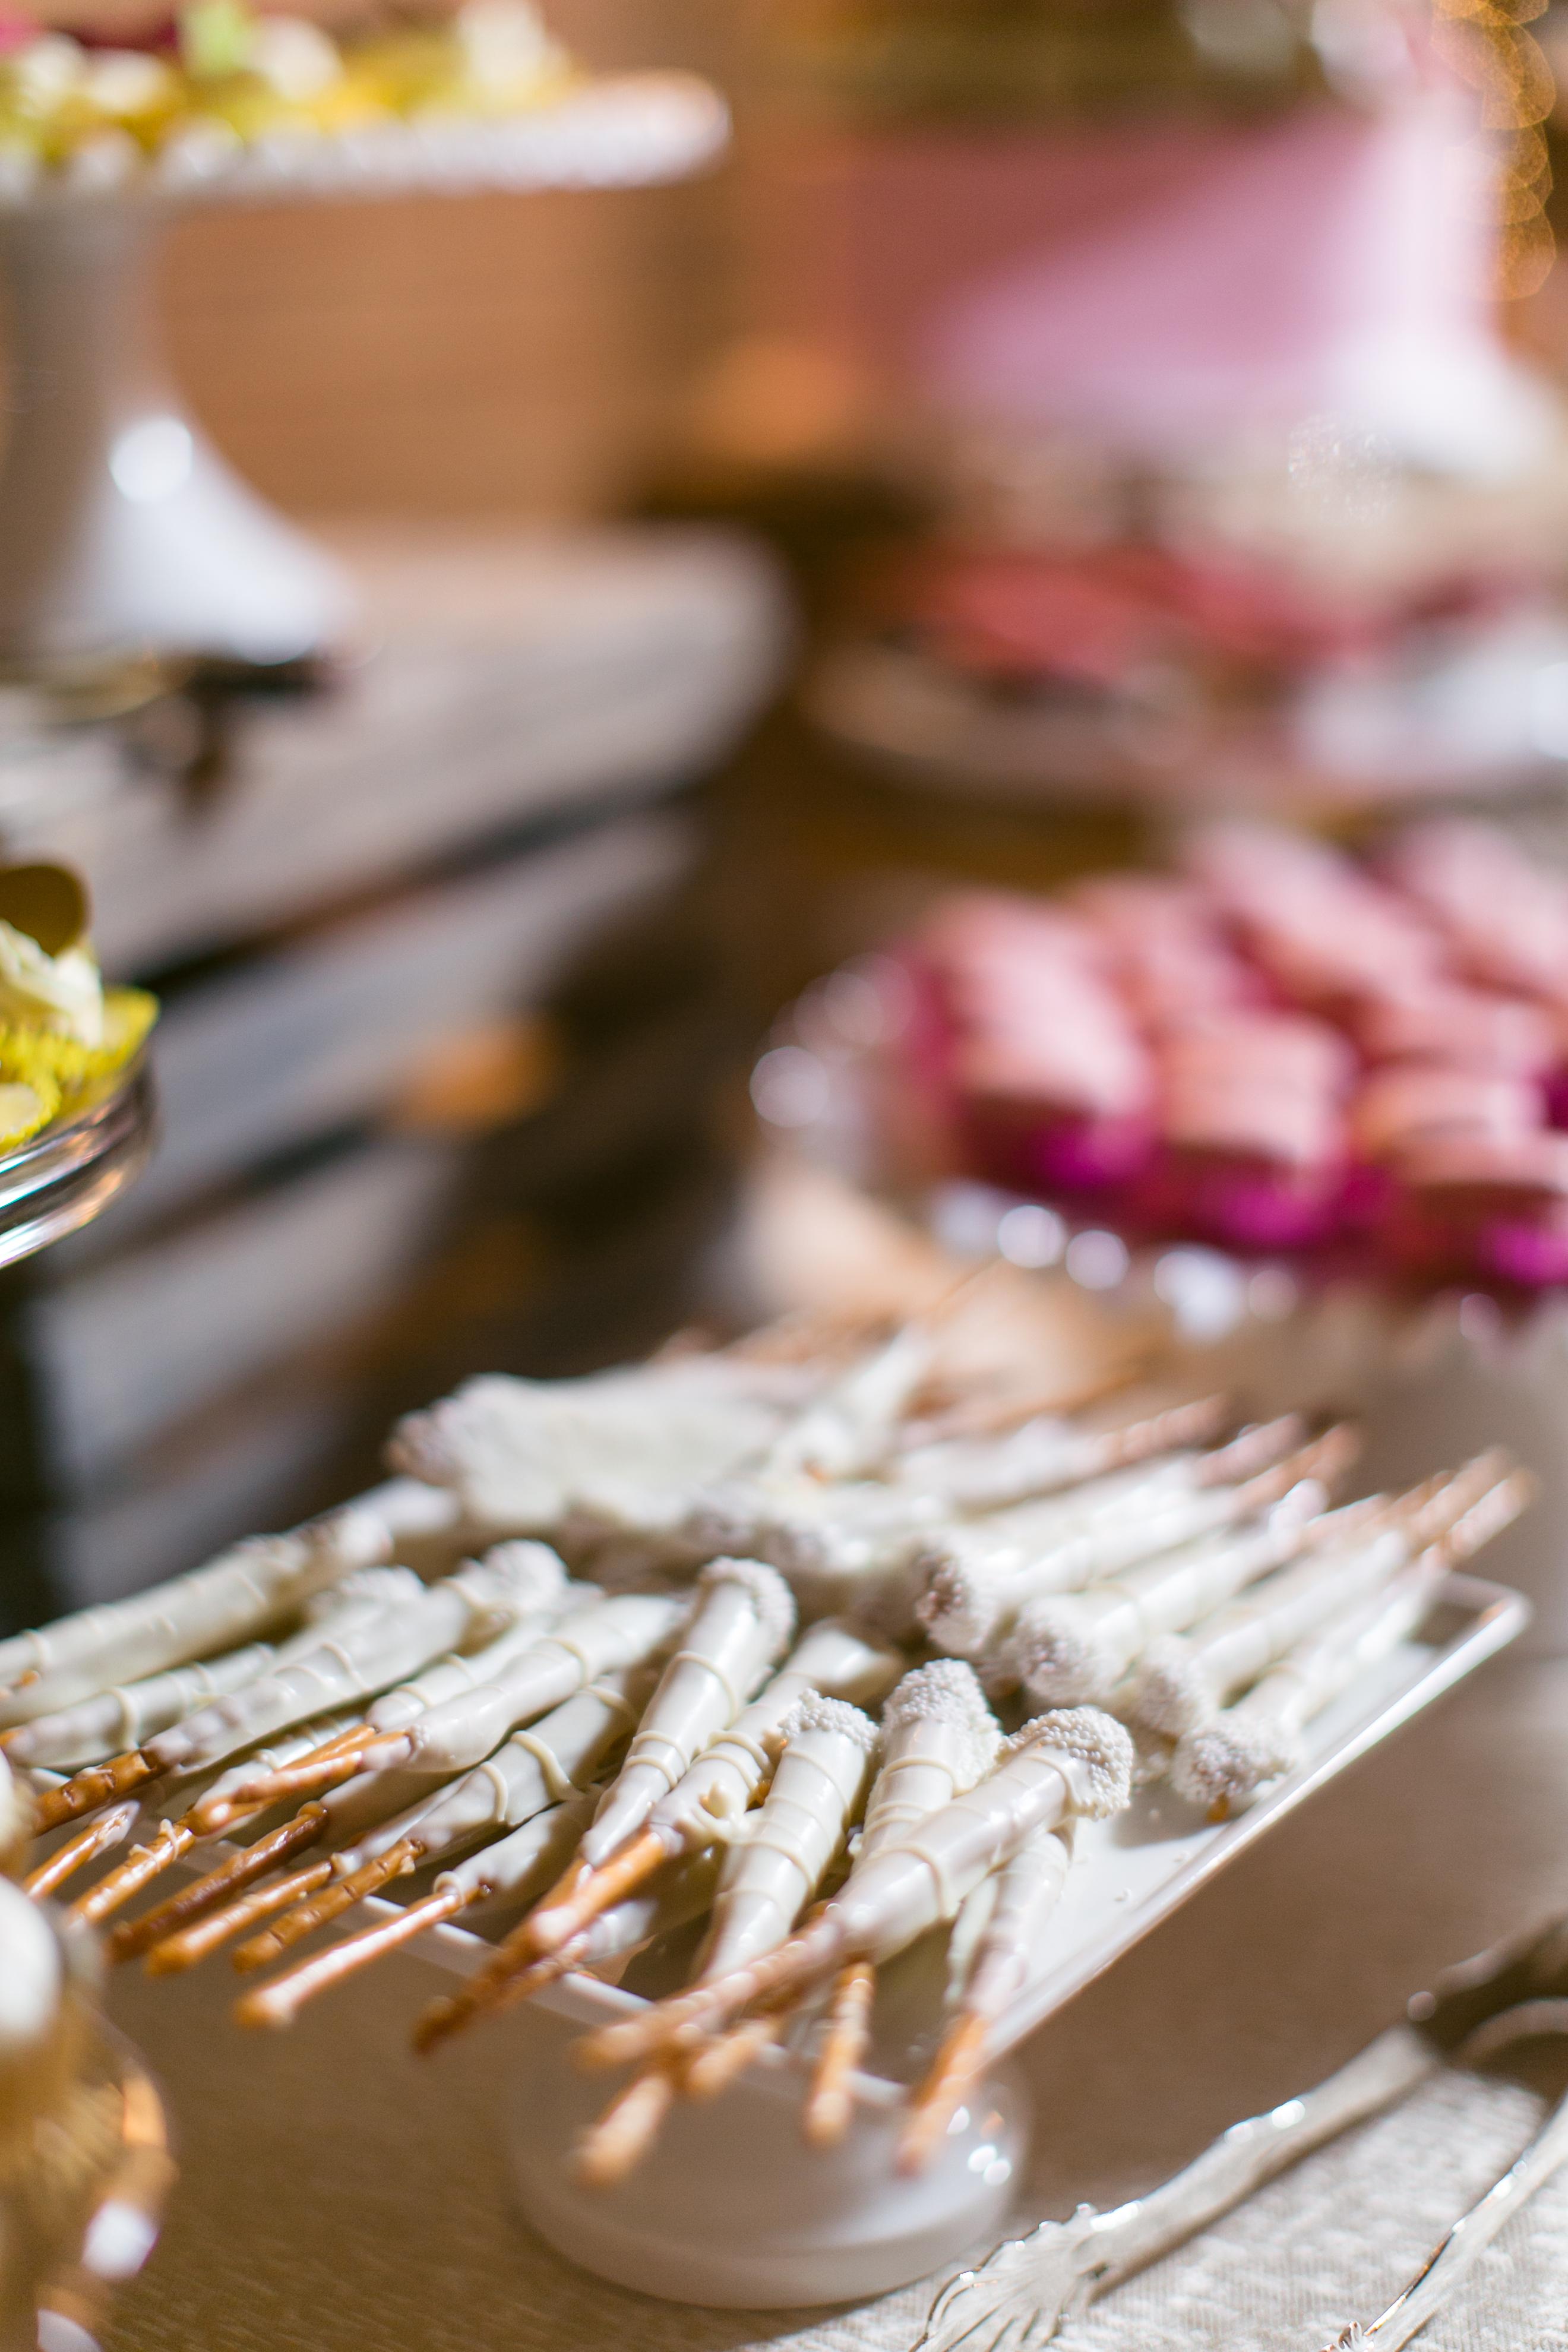 Mini pretzels from Abbie and Mark wedding photo by Caili.jpg